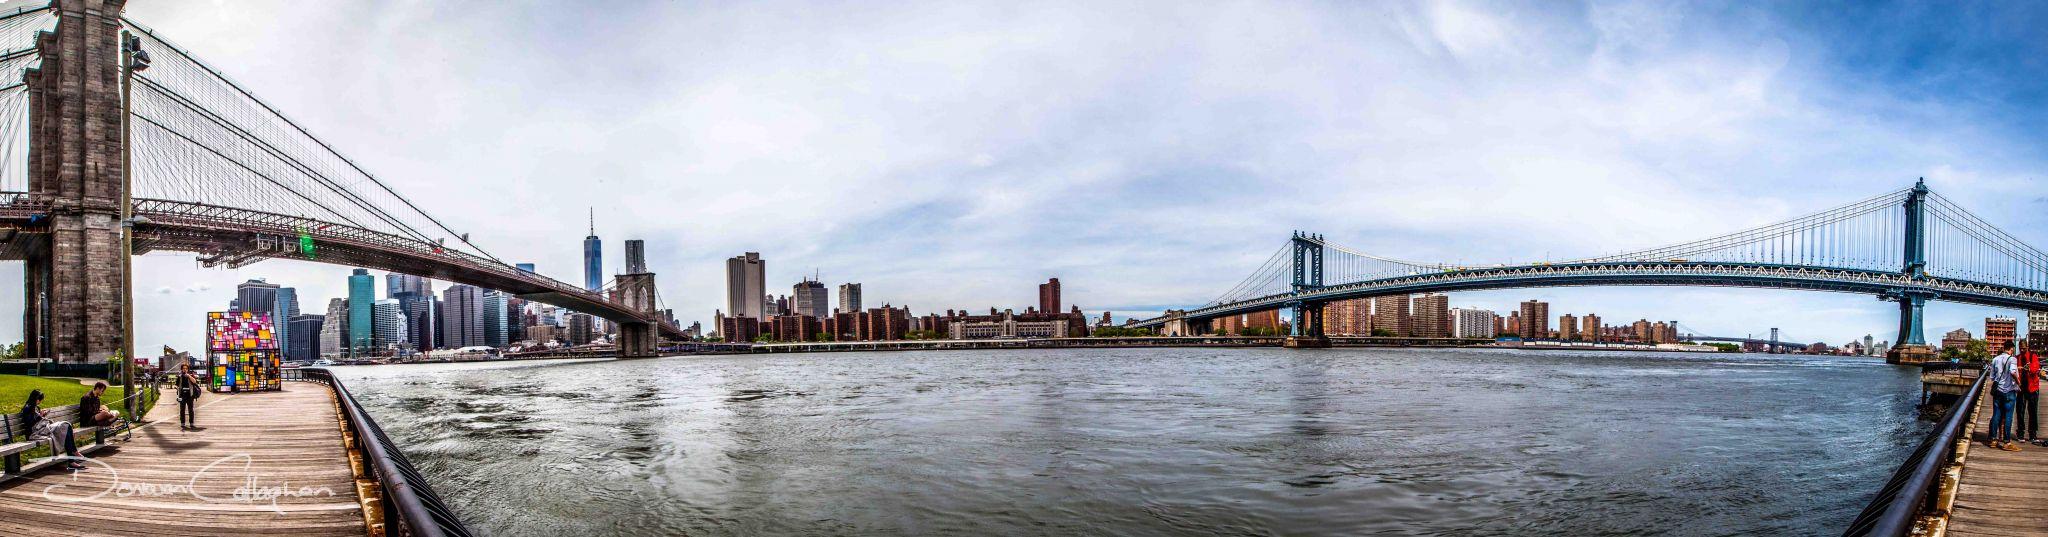 The Two Bridges Brooklyn, USA